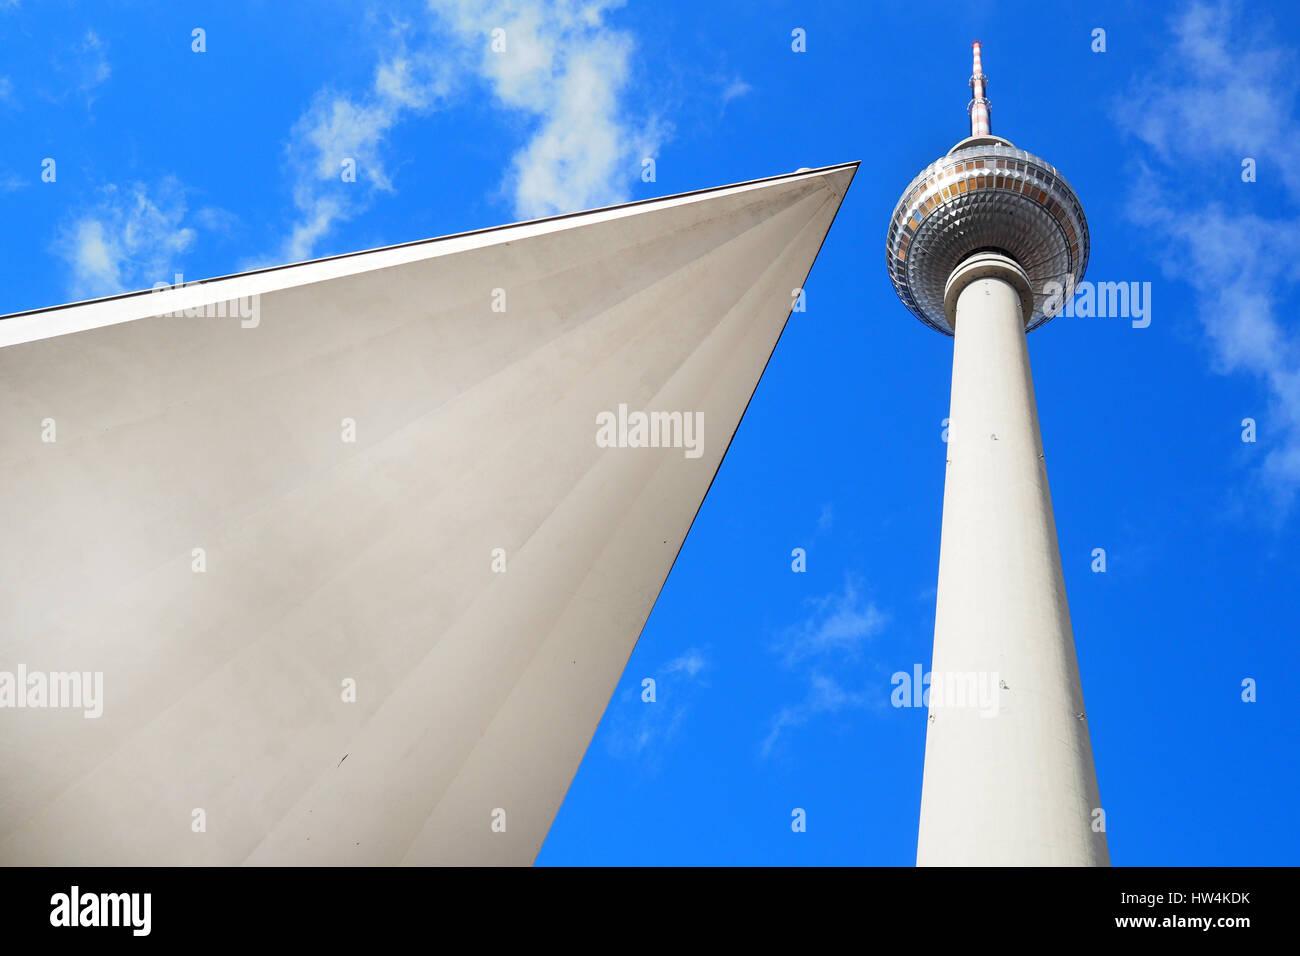 Berlin,Germany: the TV tower in Alexanderplatz - Stock Image